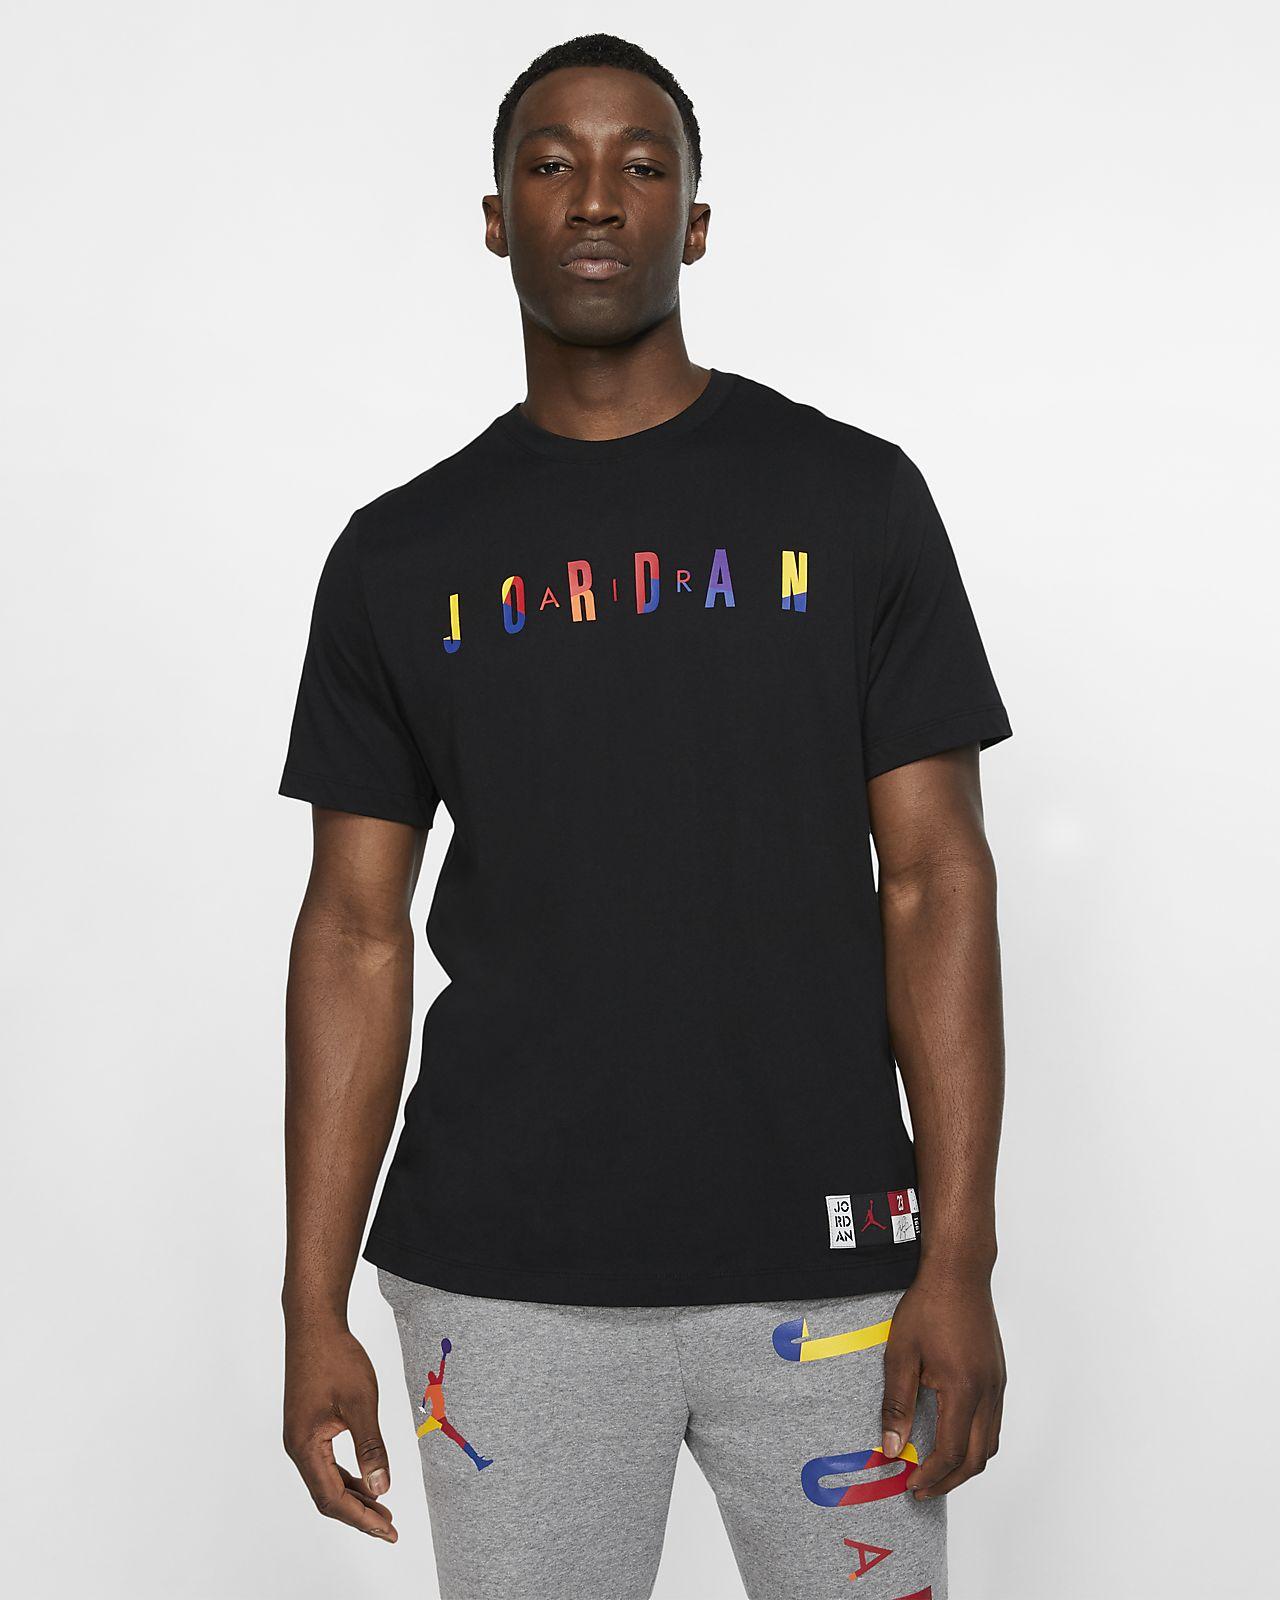 Jordan DNA Camiseta - Hombre